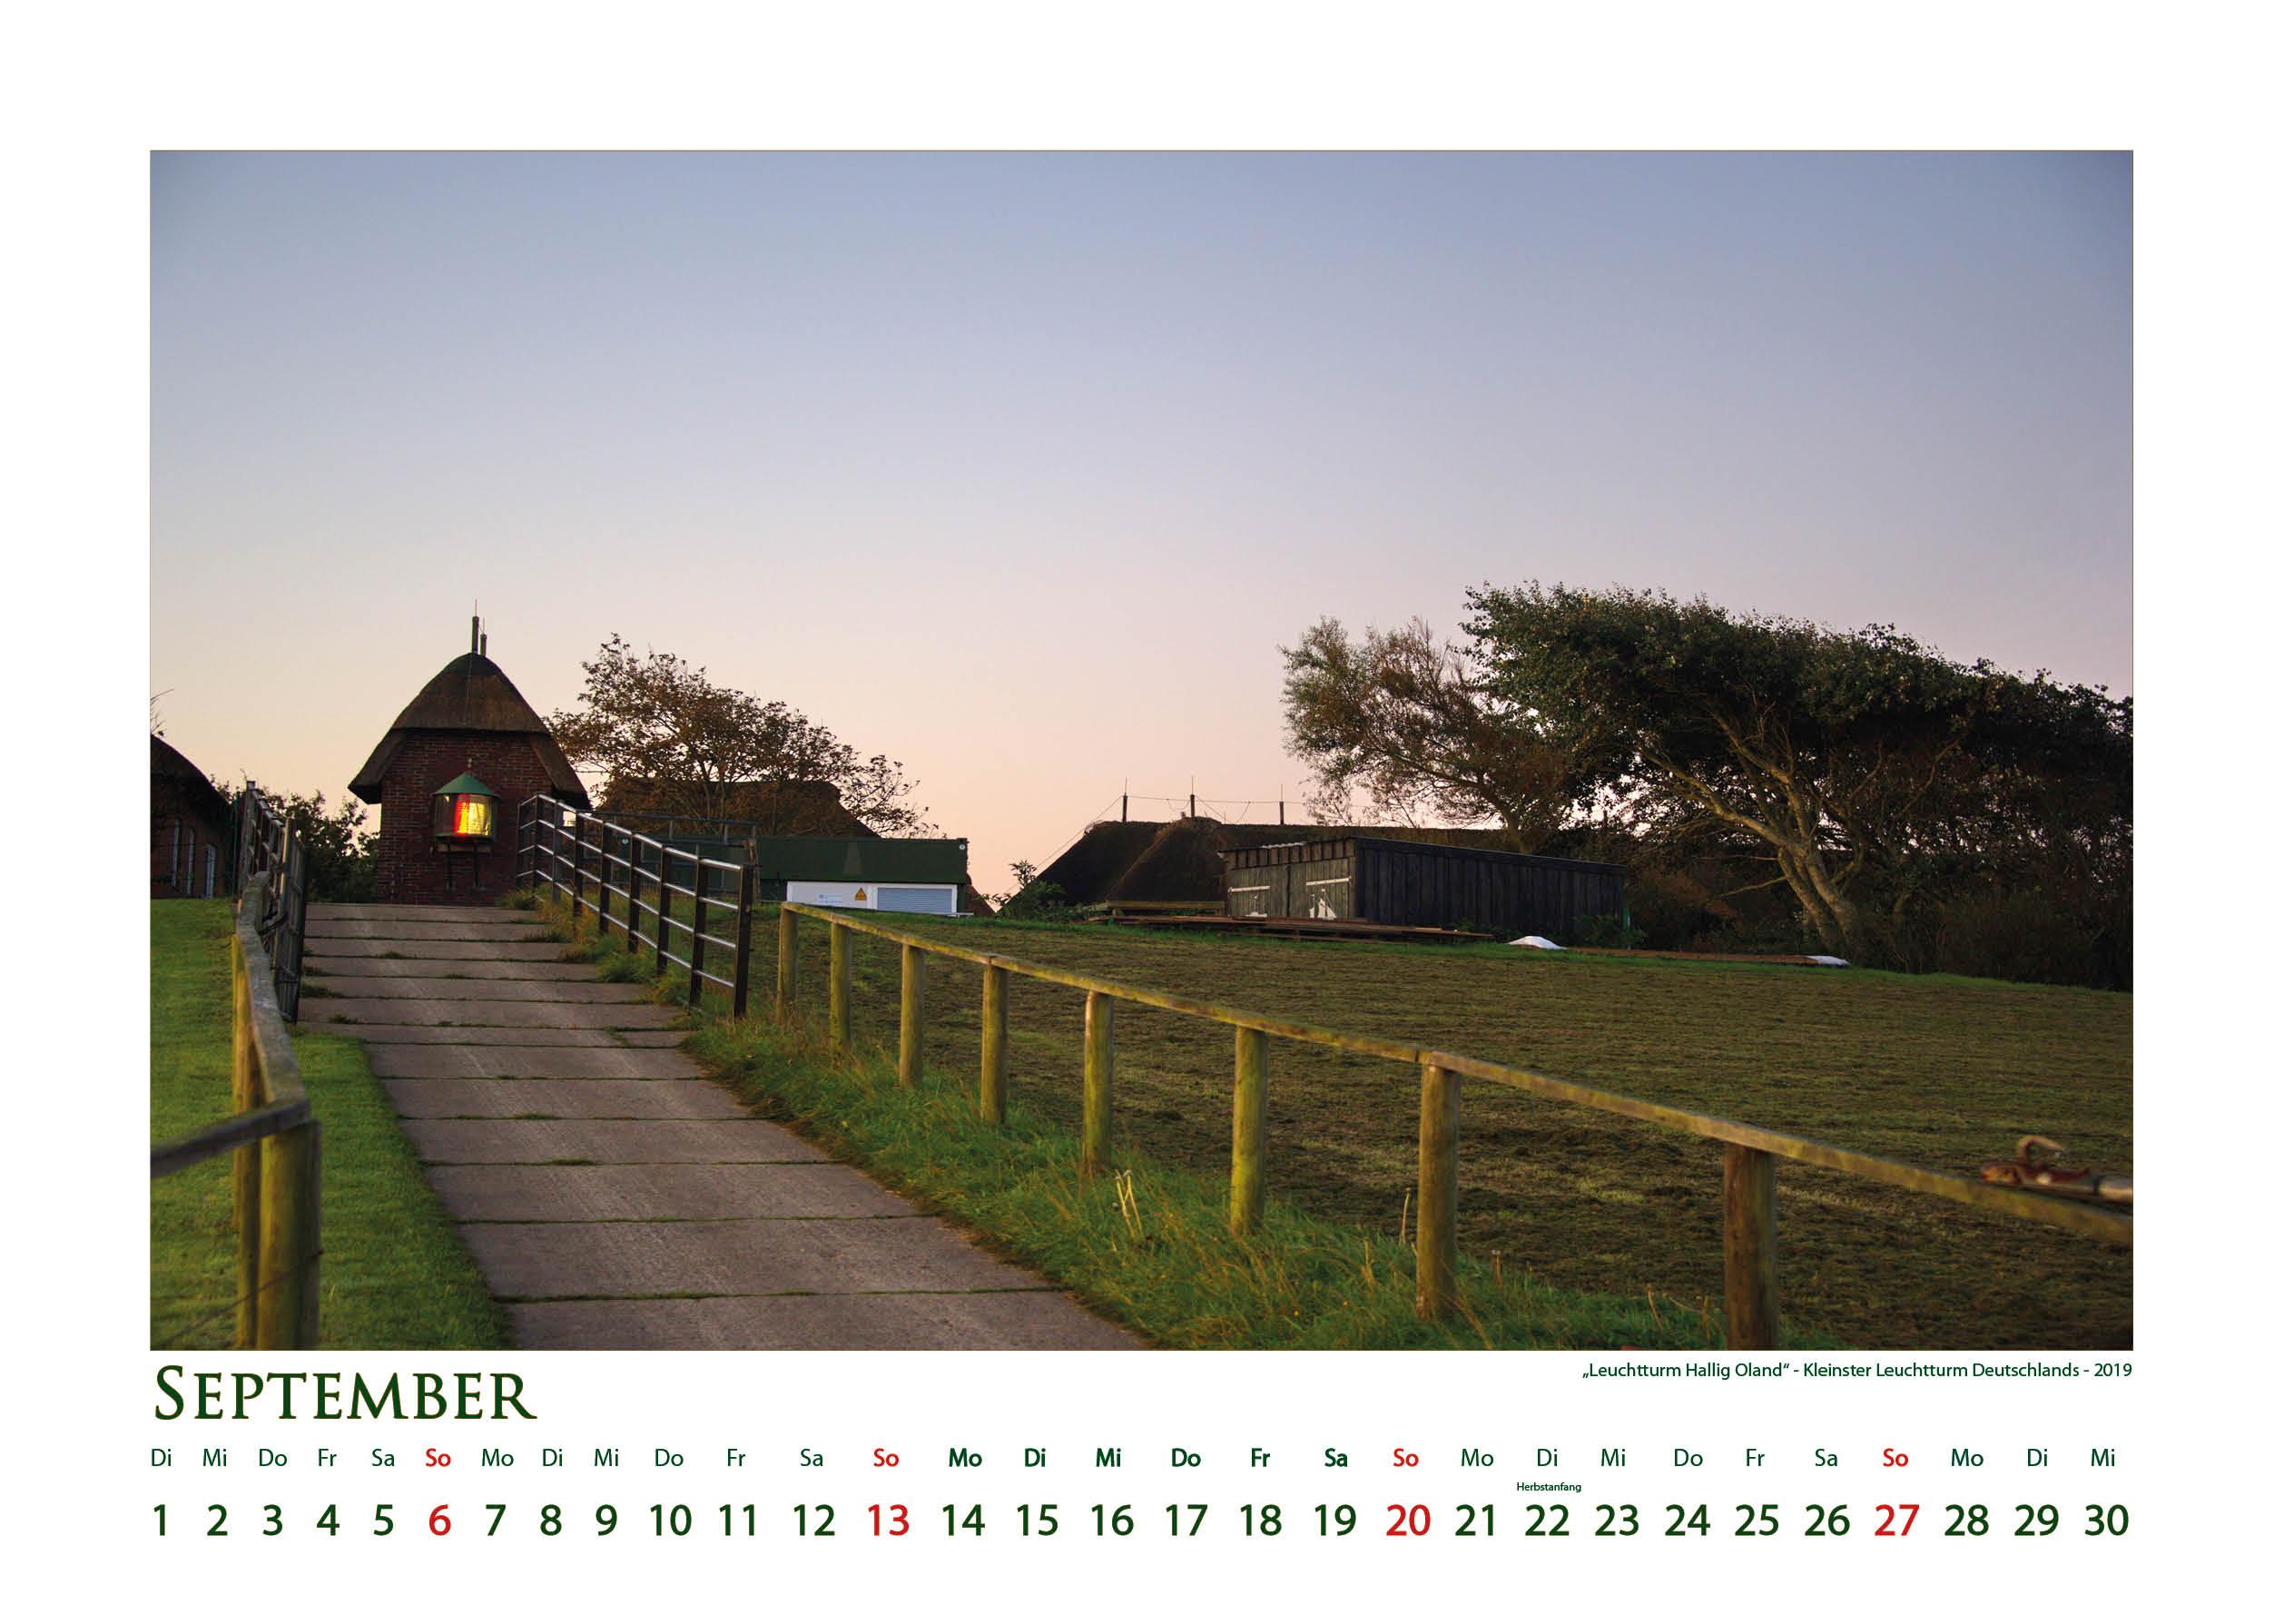 Leuchtturm Oland - Leuchttürme - Kalender 2020 © Katharina Hansen-Gluschitz